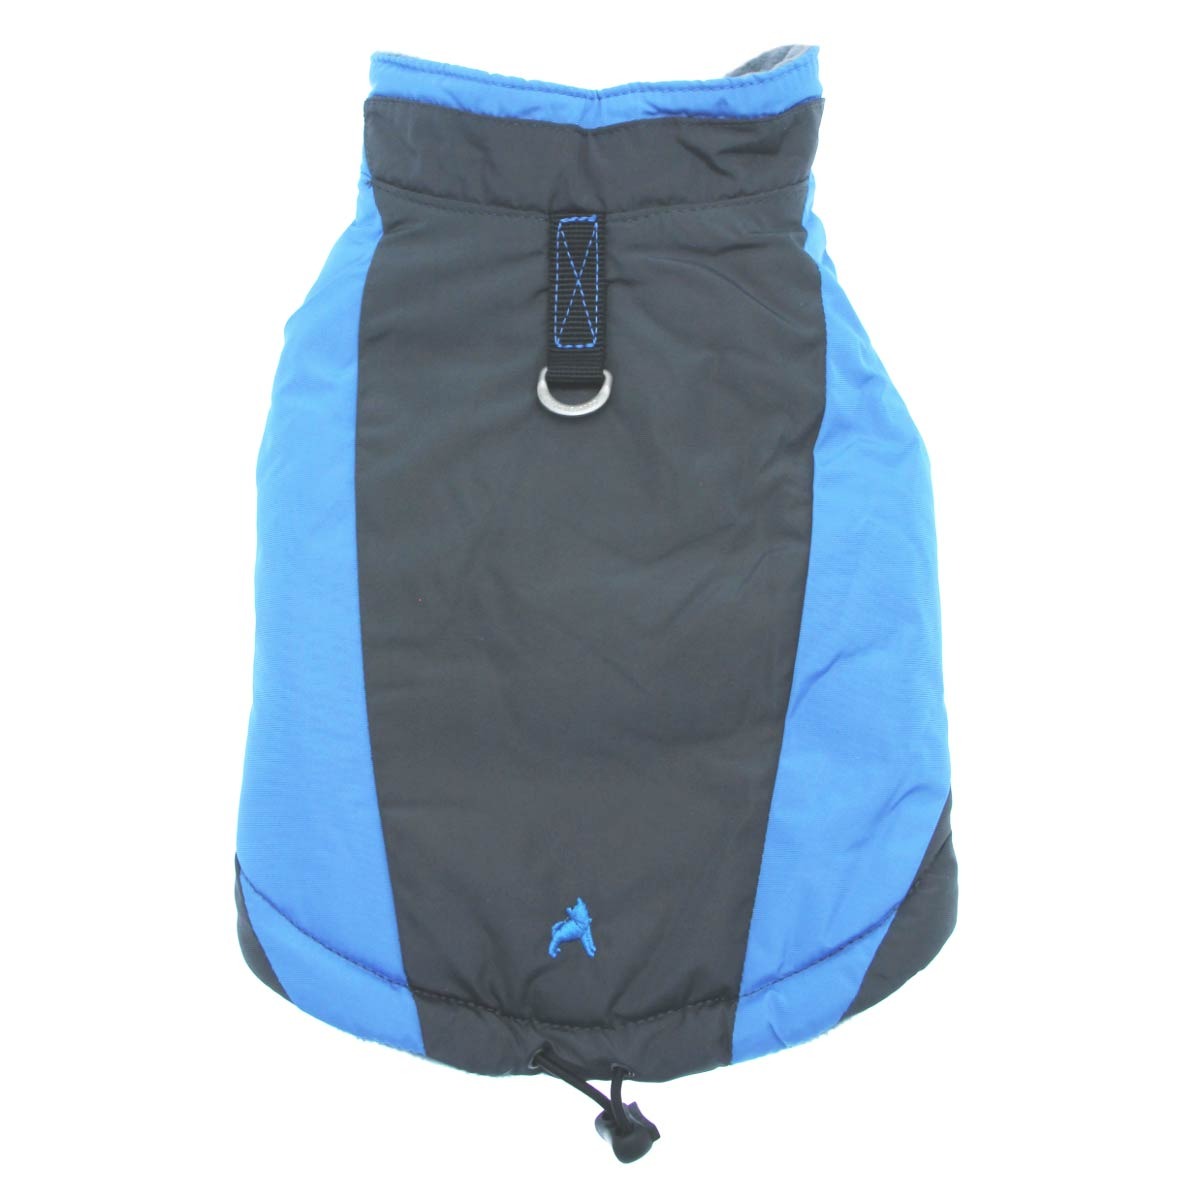 Trekking Dog Jacket by Gooby - Ocean Blue